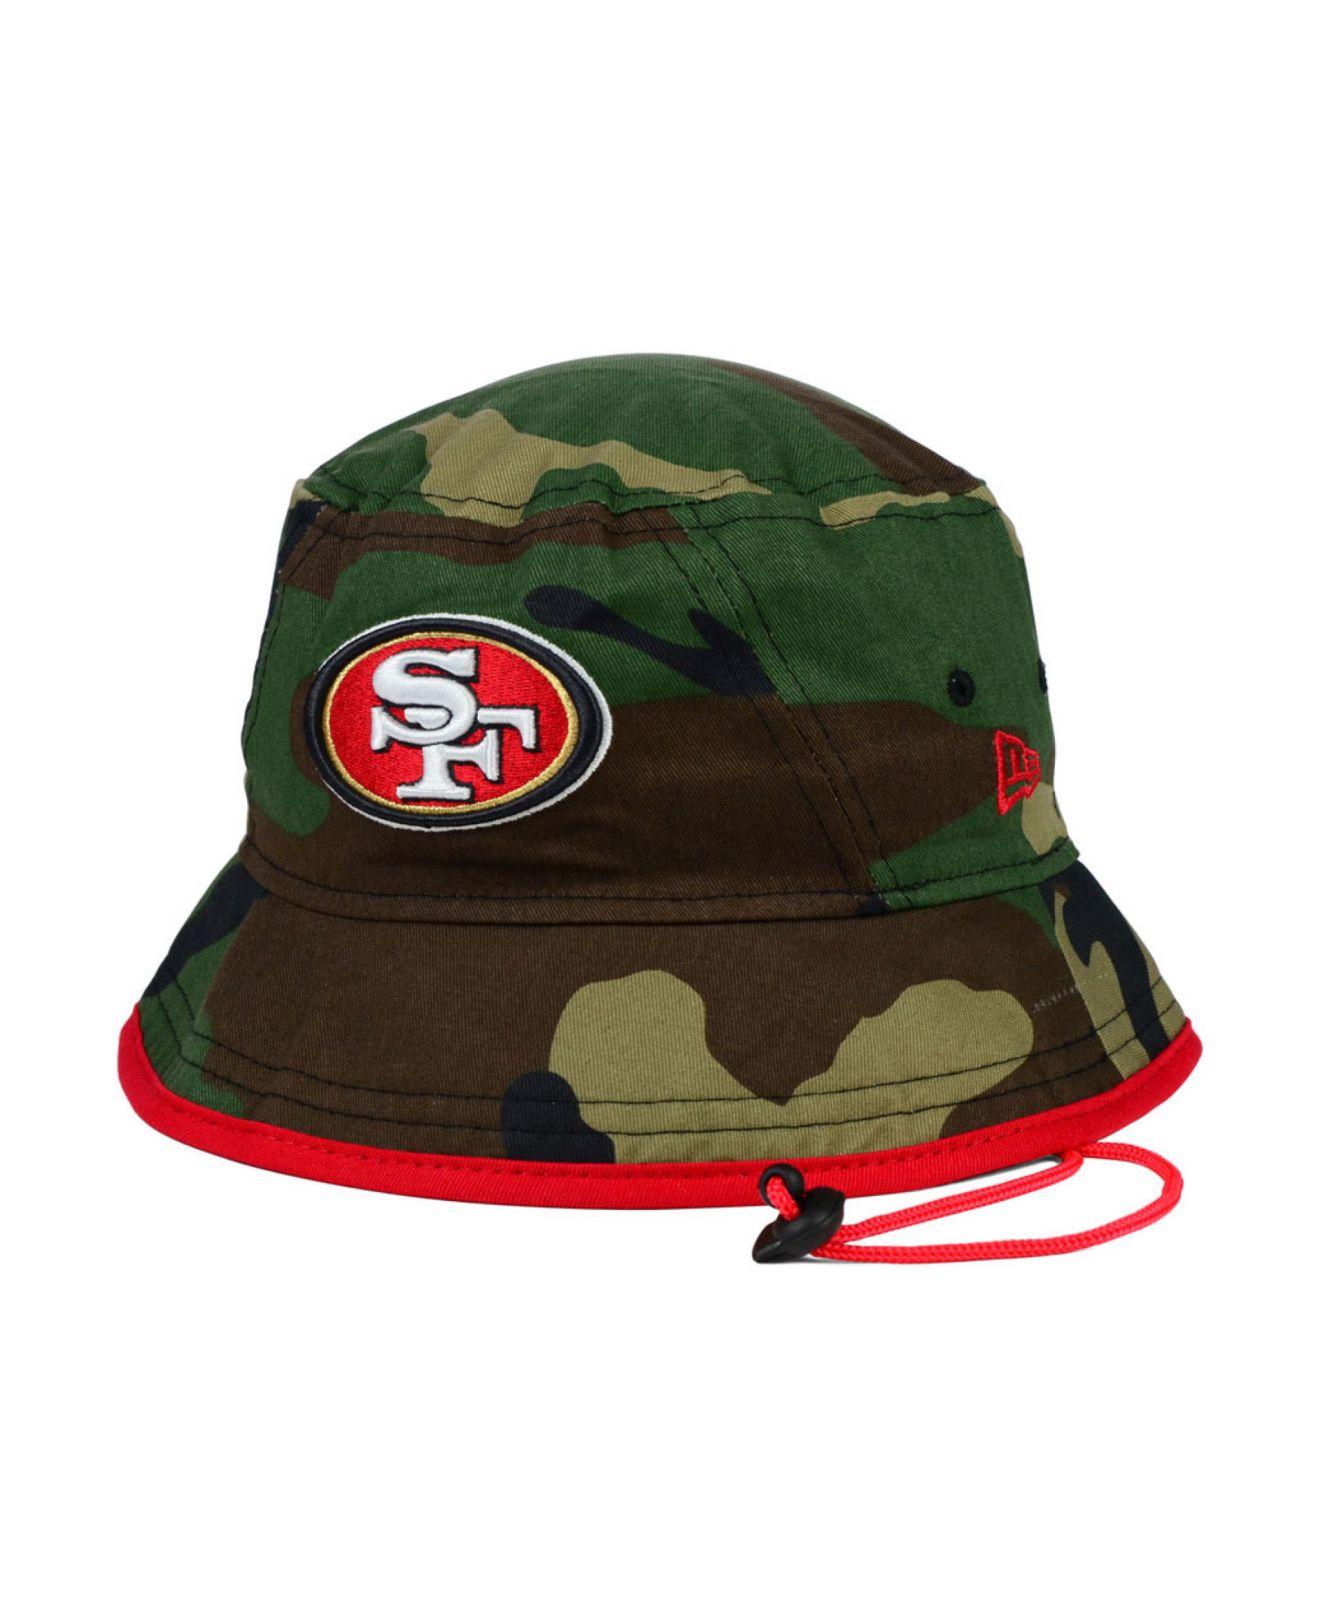 Lyst - KTZ San Francisco 49Ers Camo Pop Bucket Hat in Green for Men ea0d3bc3118